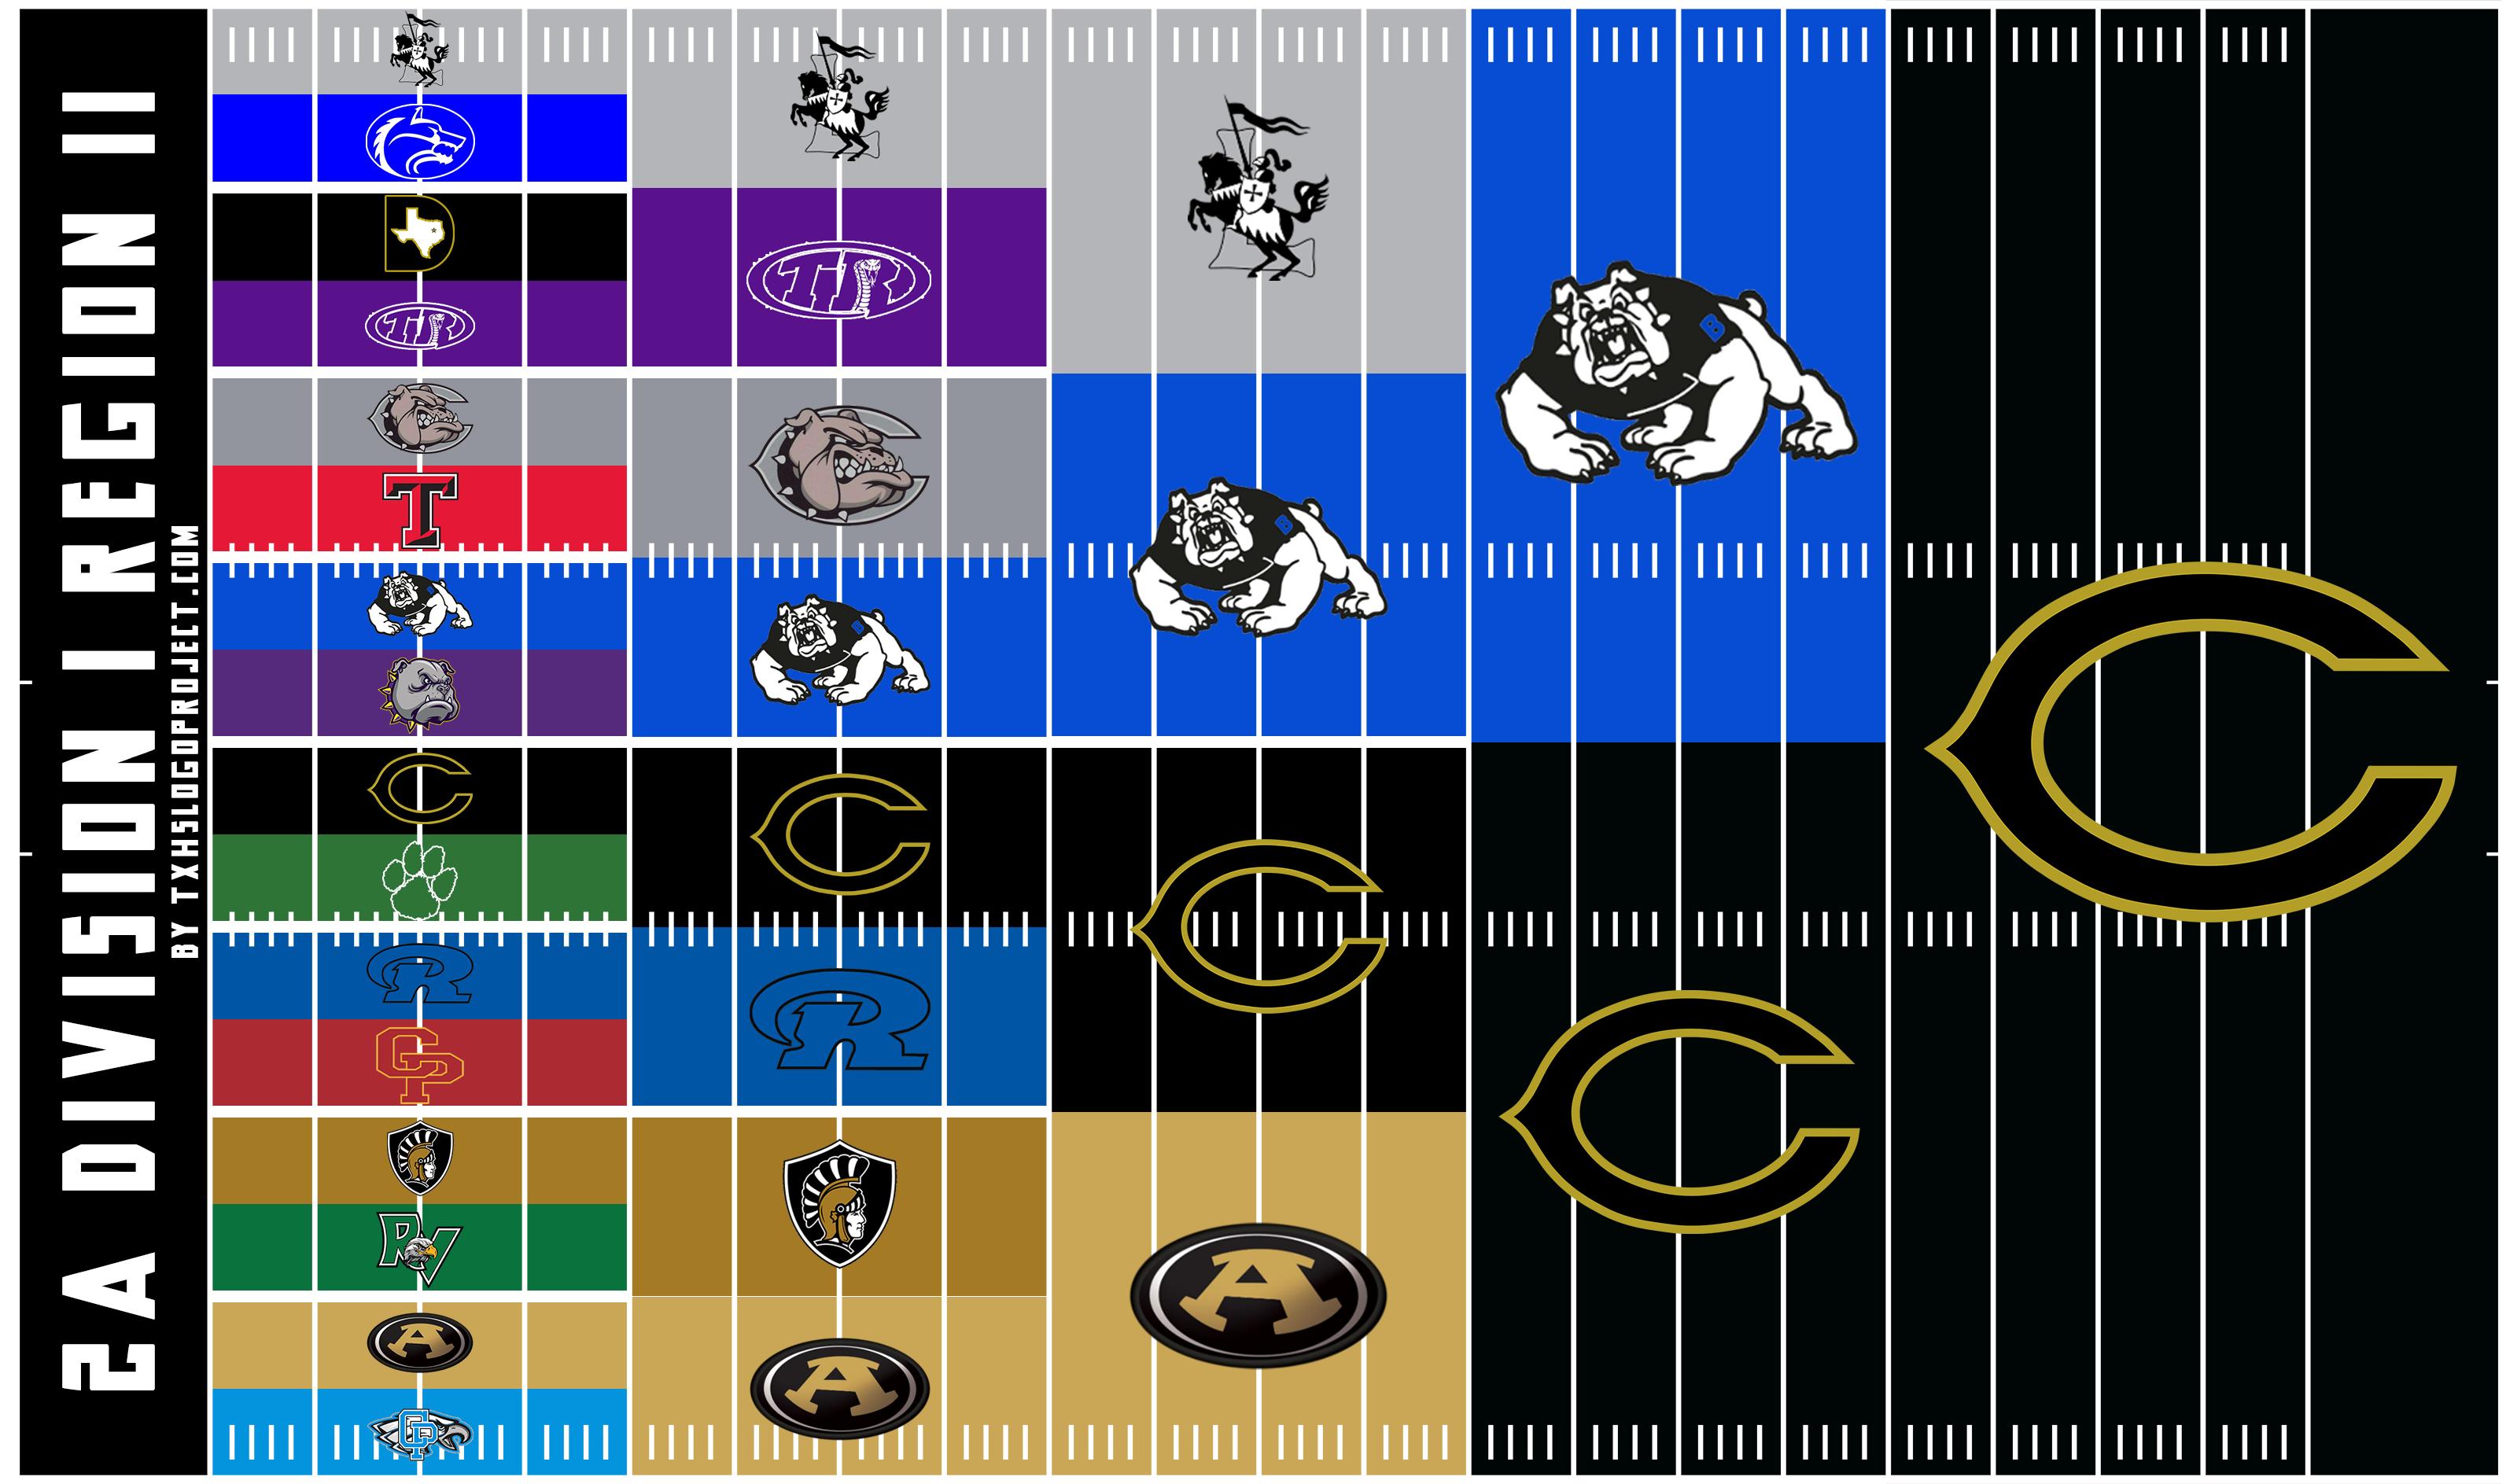 2A Division I Region II